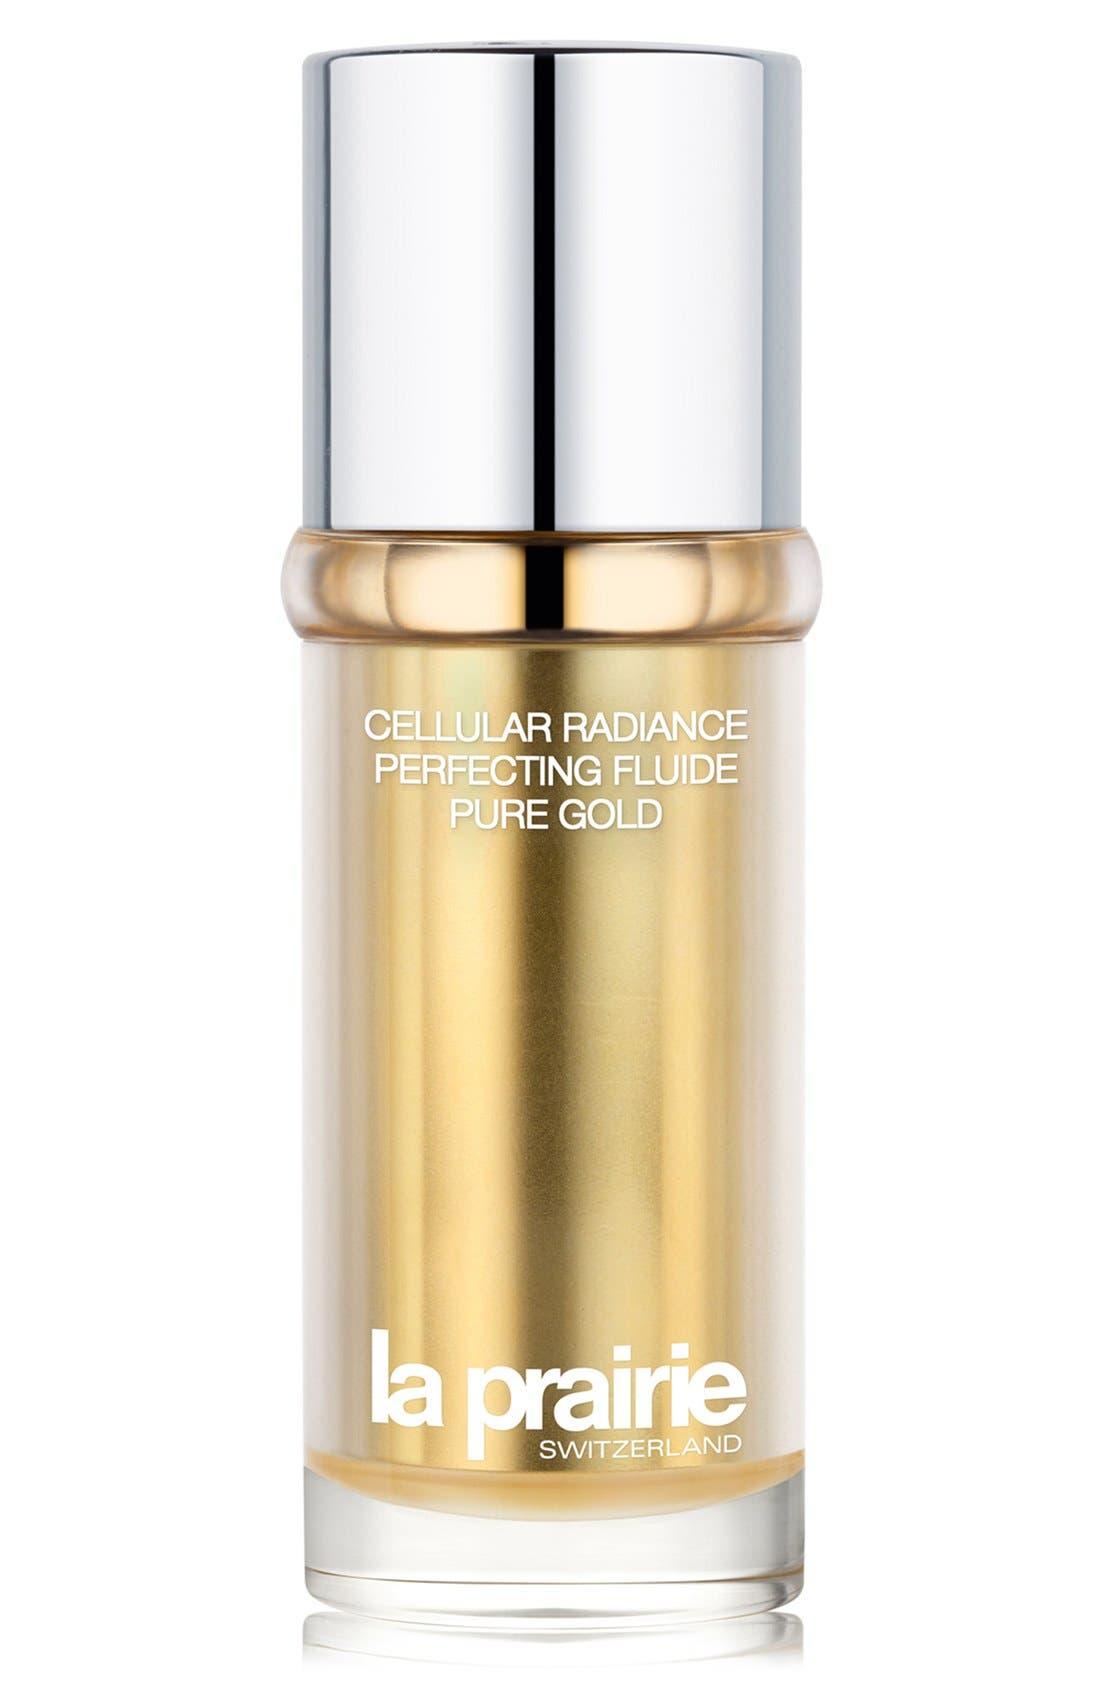 La Prairie 'Cellular Radiance' Perfecting Fluide Pure Gold Moisturizer